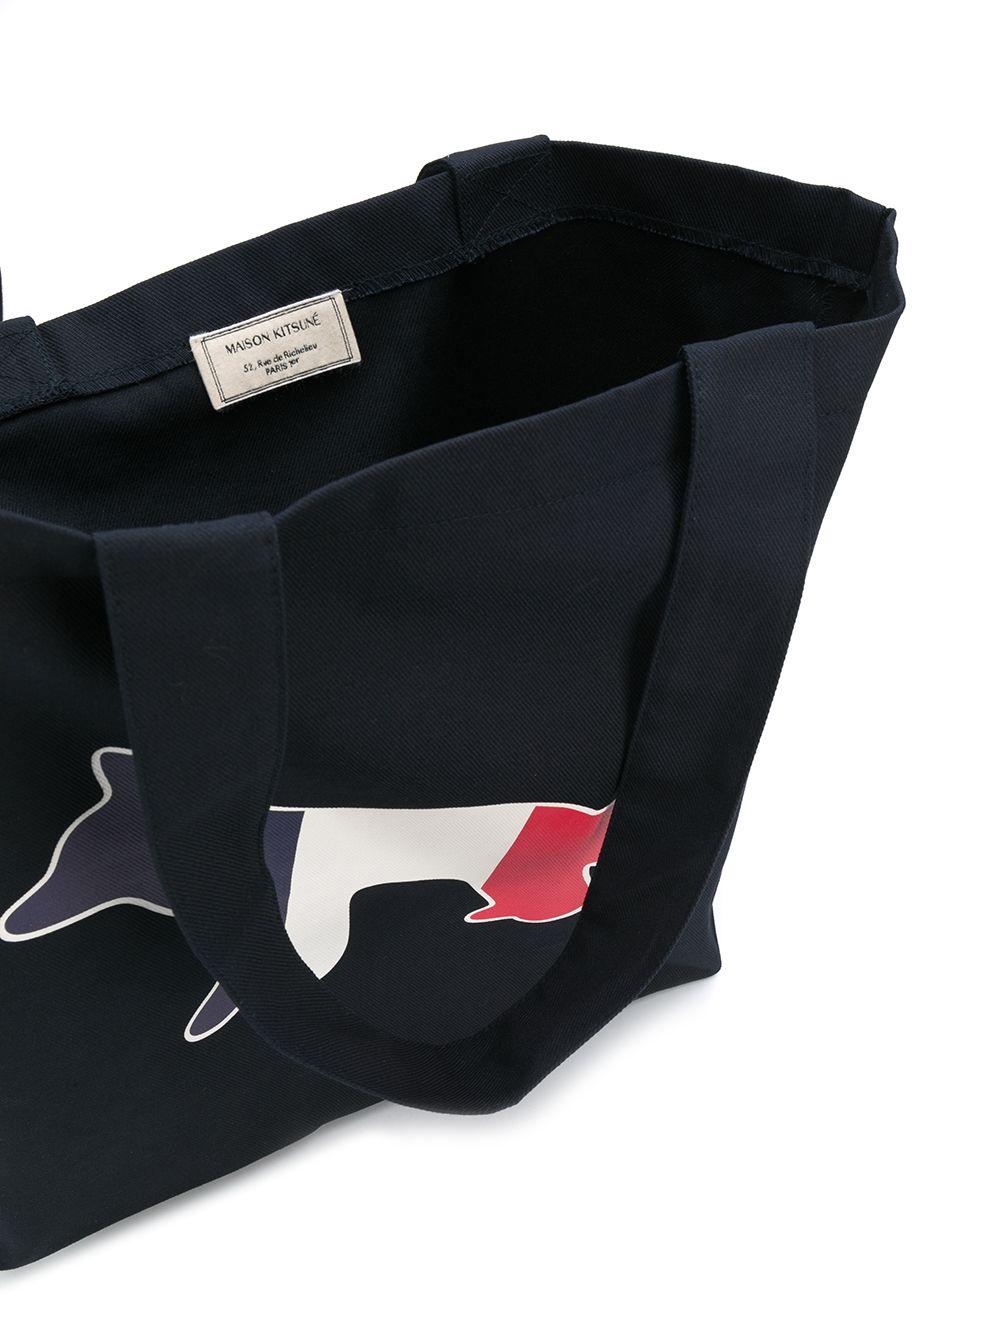 Maison Kitsuné borsa con logo unisex MAISON KITSUNÉ | Borse | AU05101WW0007NA